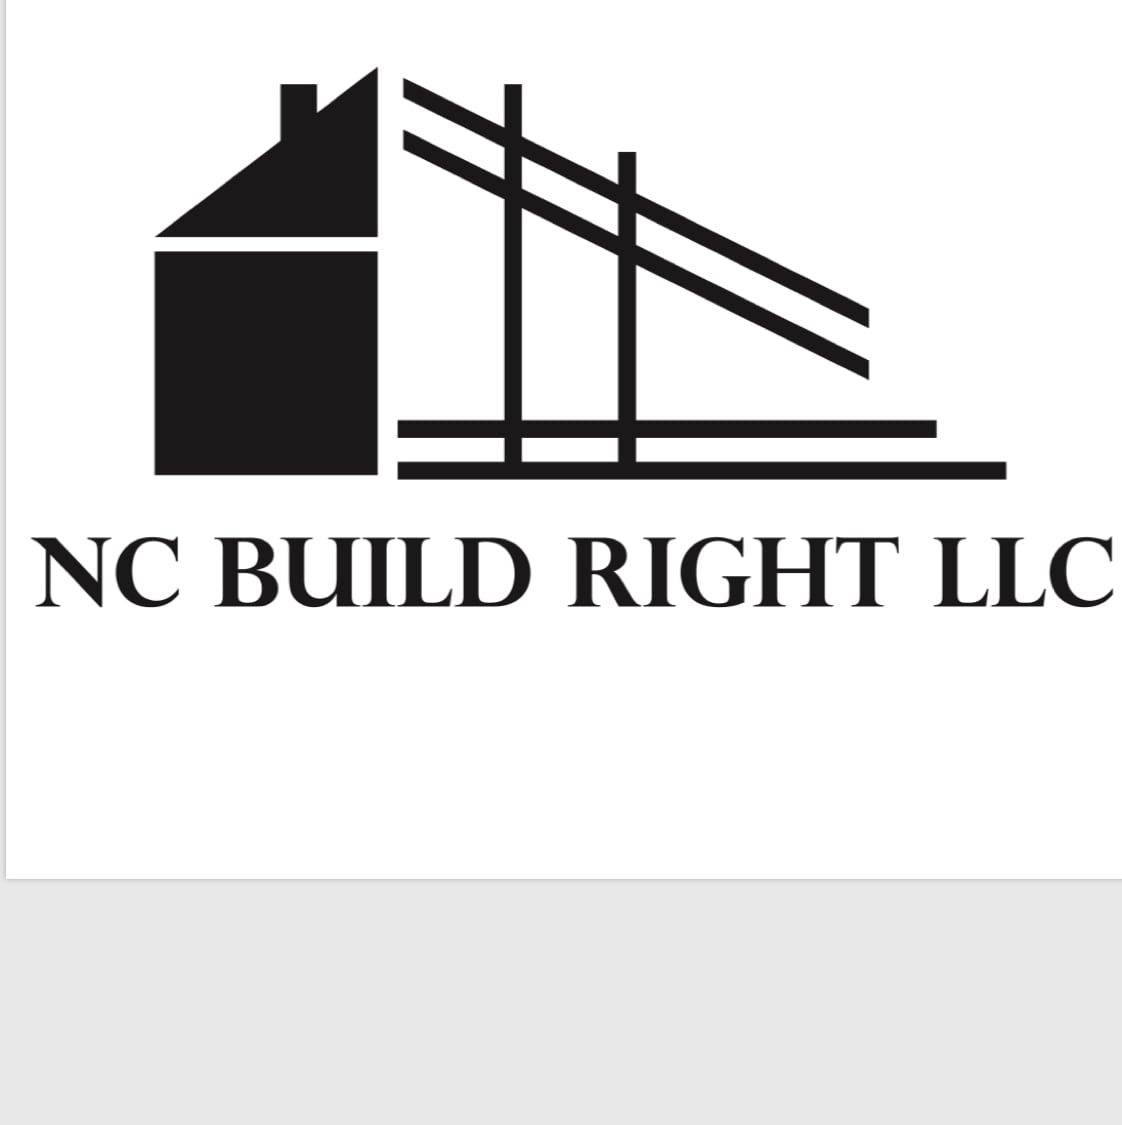 NC BUILD RIGHT